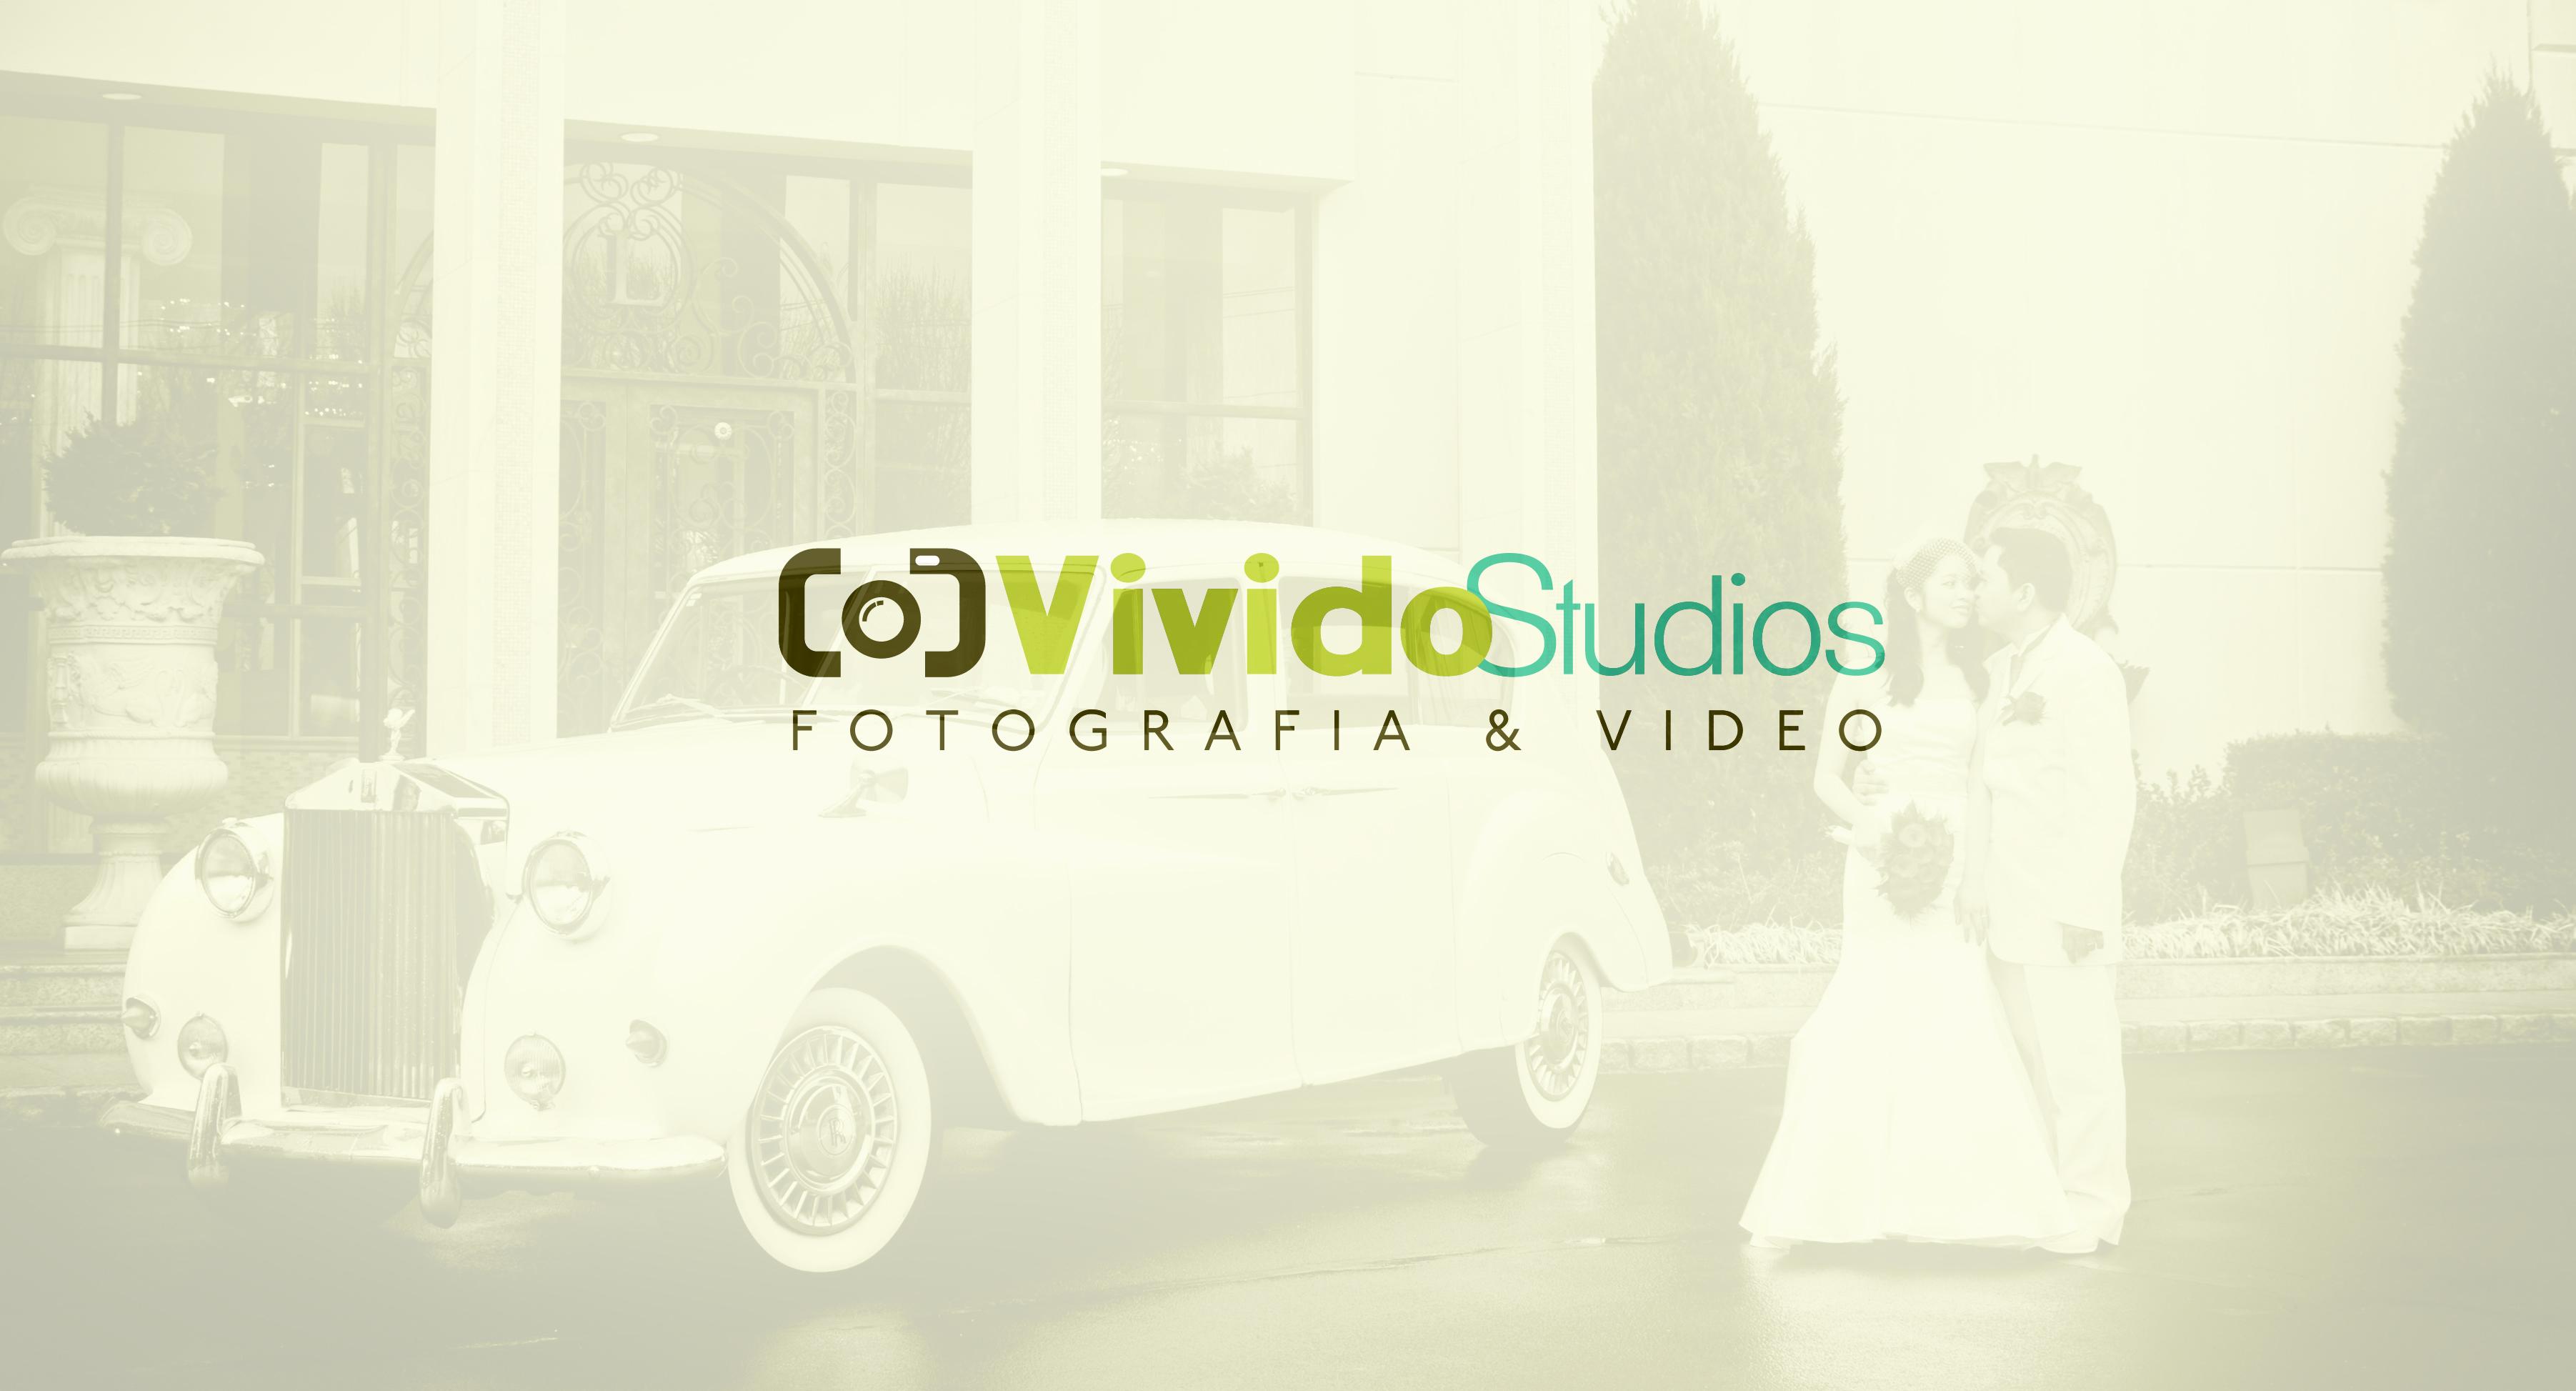 Vivido Studios